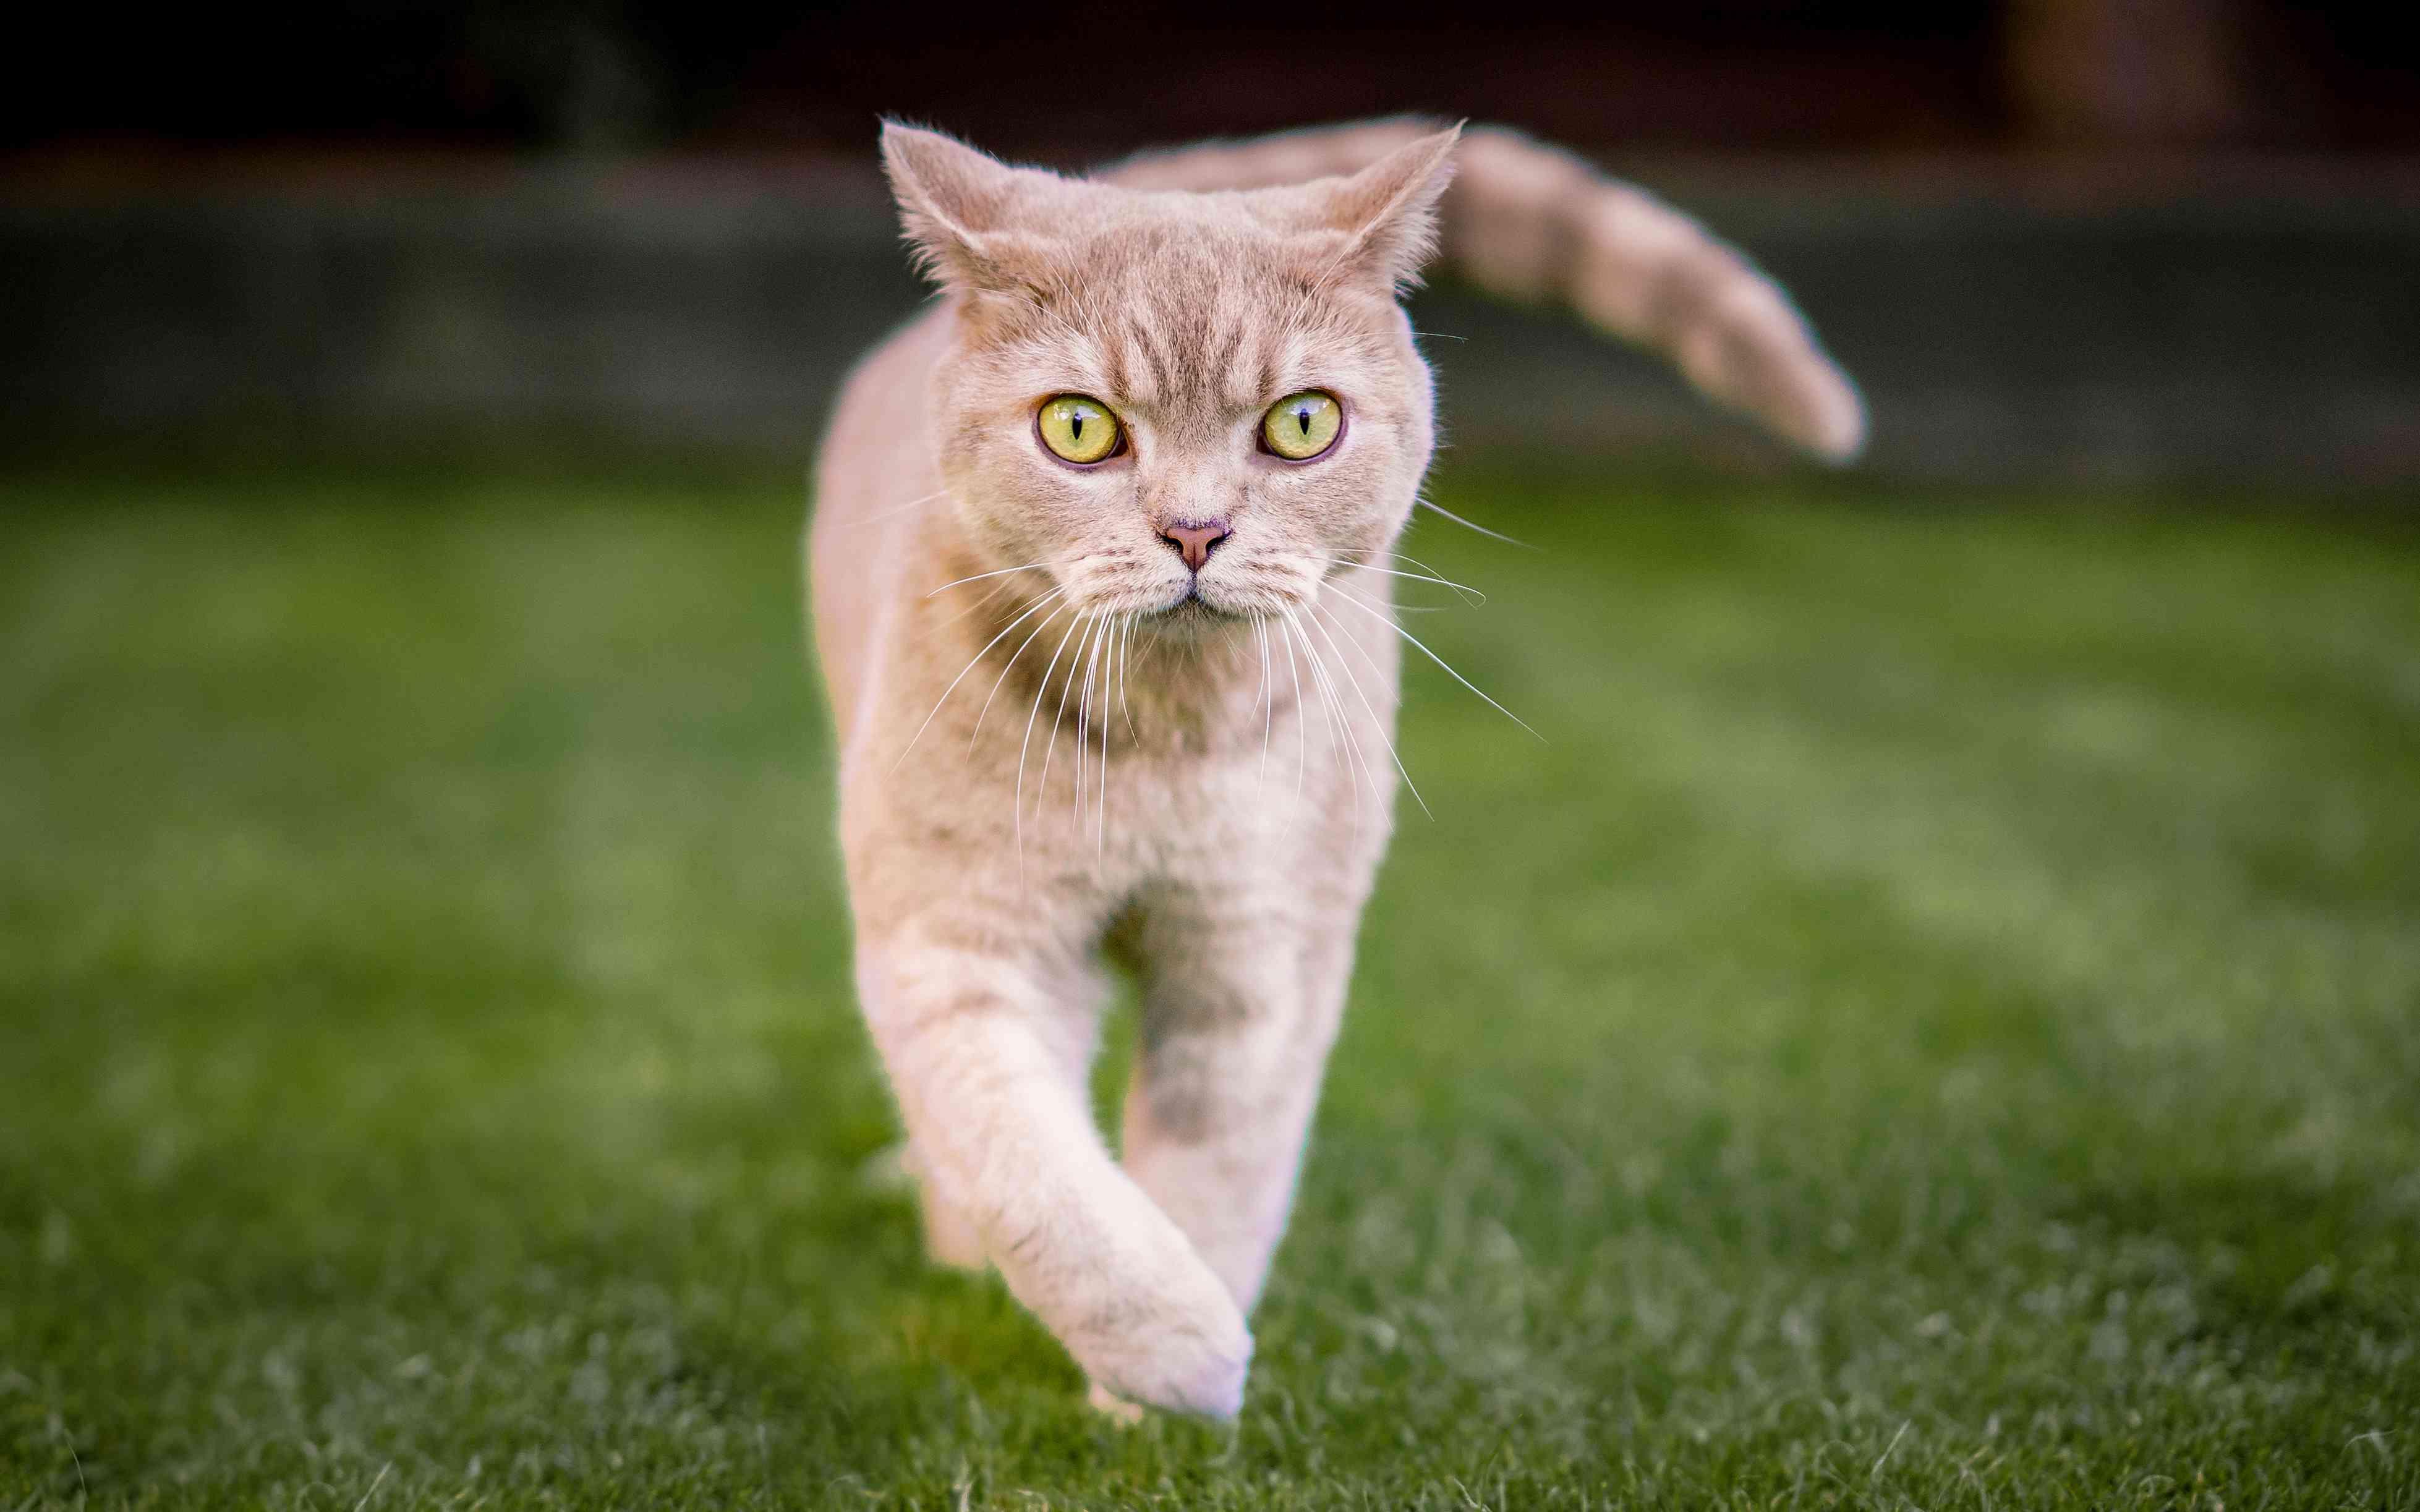 Tabby British Shorthair walking on grass